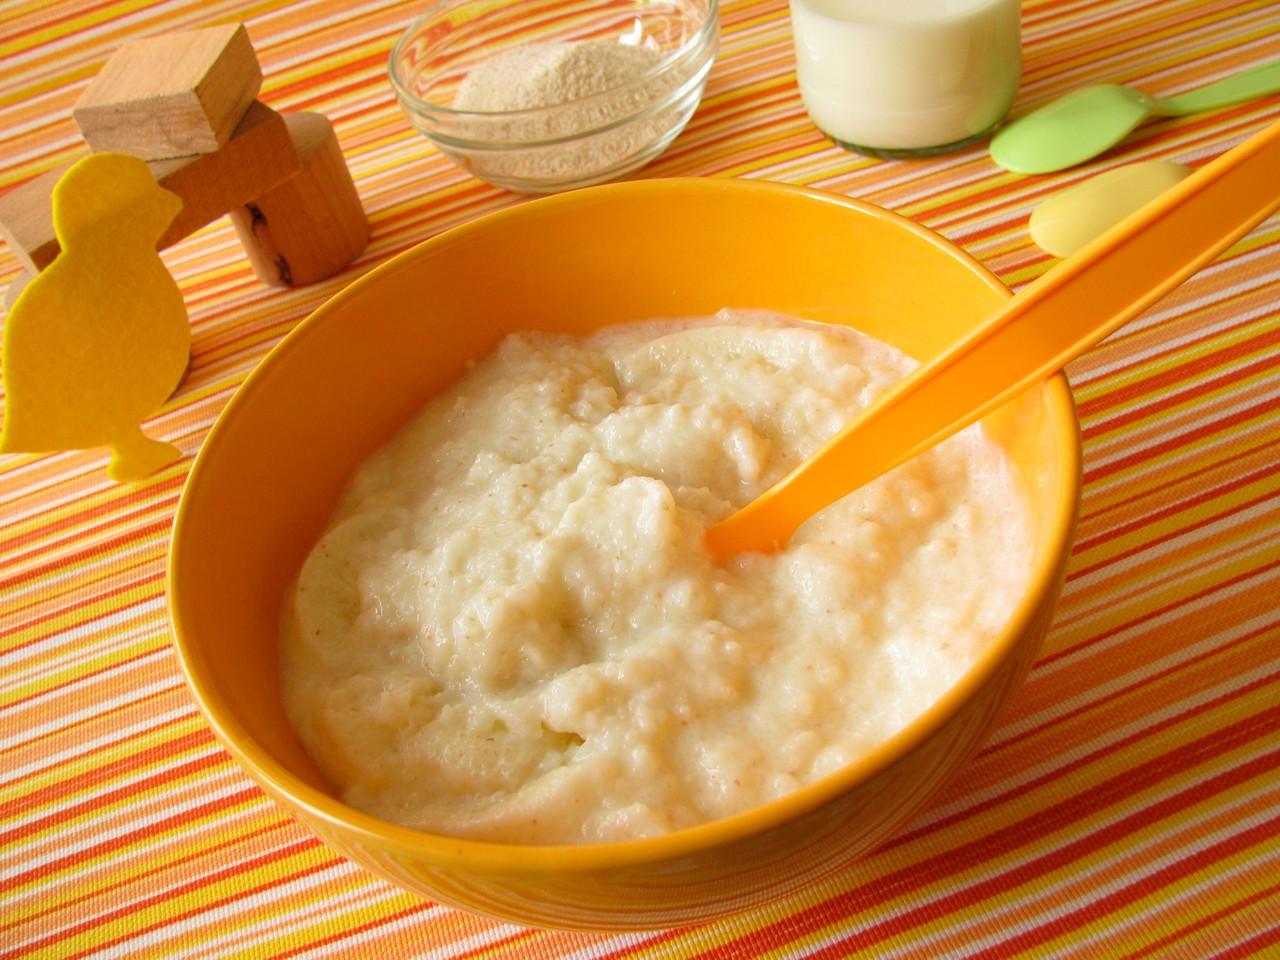 Apple baby rice